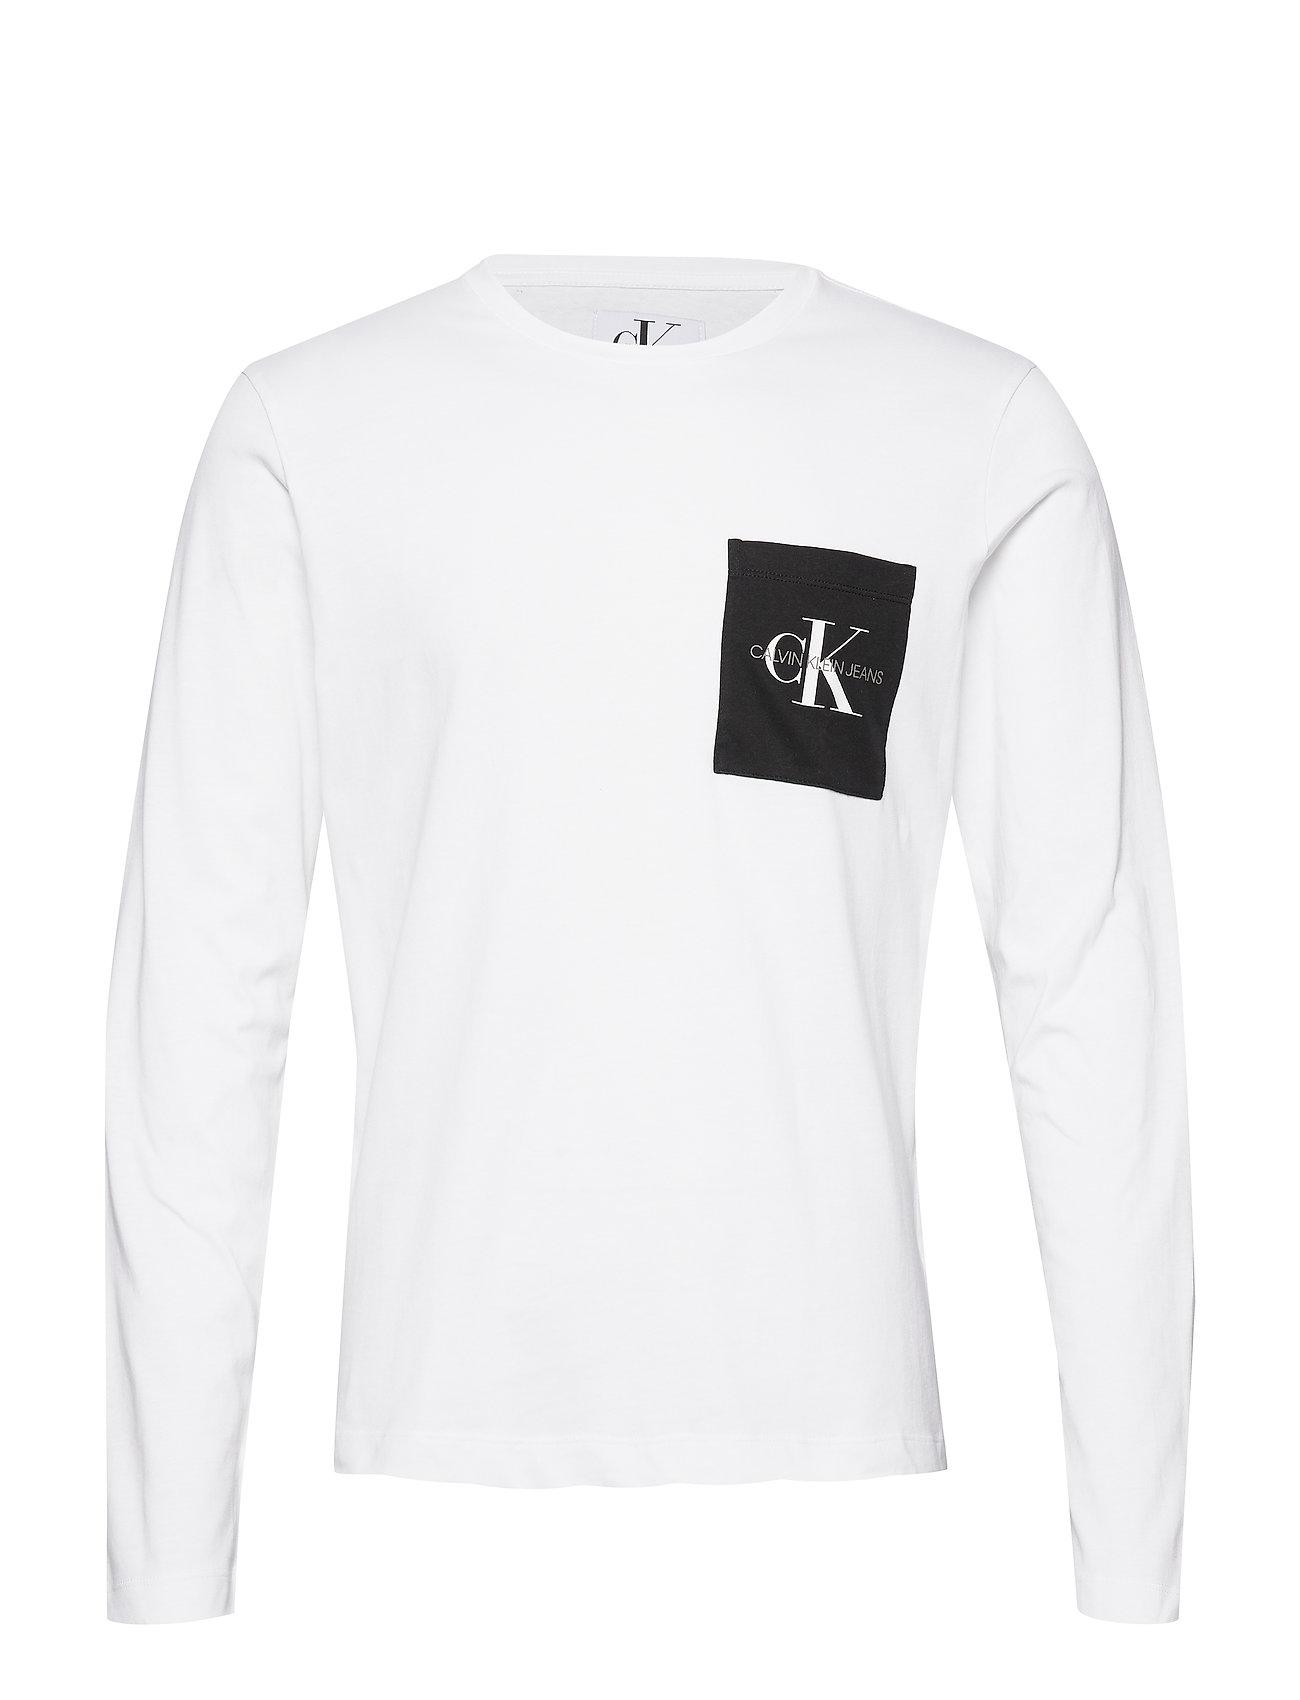 Calvin Klein Jeans MONOGRAM POCKET SLIM LS TEE - BRIGHT WHITE/ CK BLACK